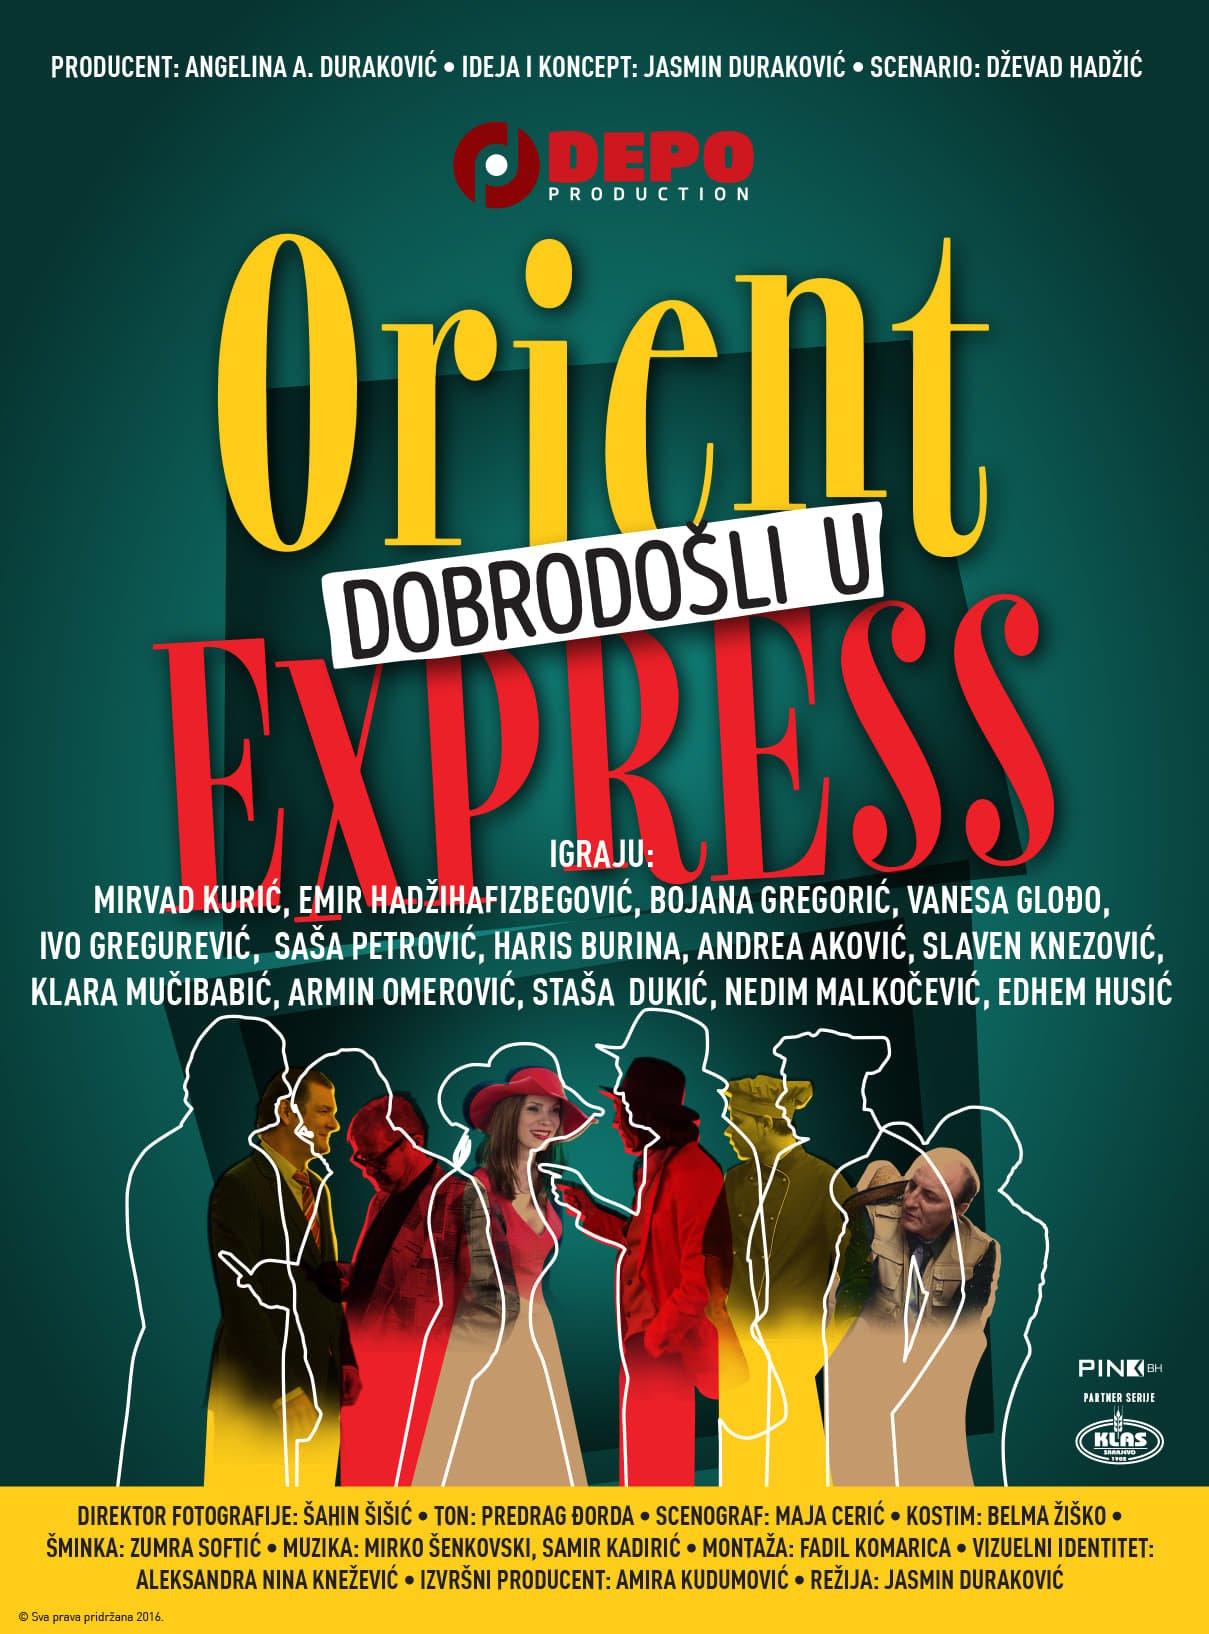 Dobrodosli u Orient Express